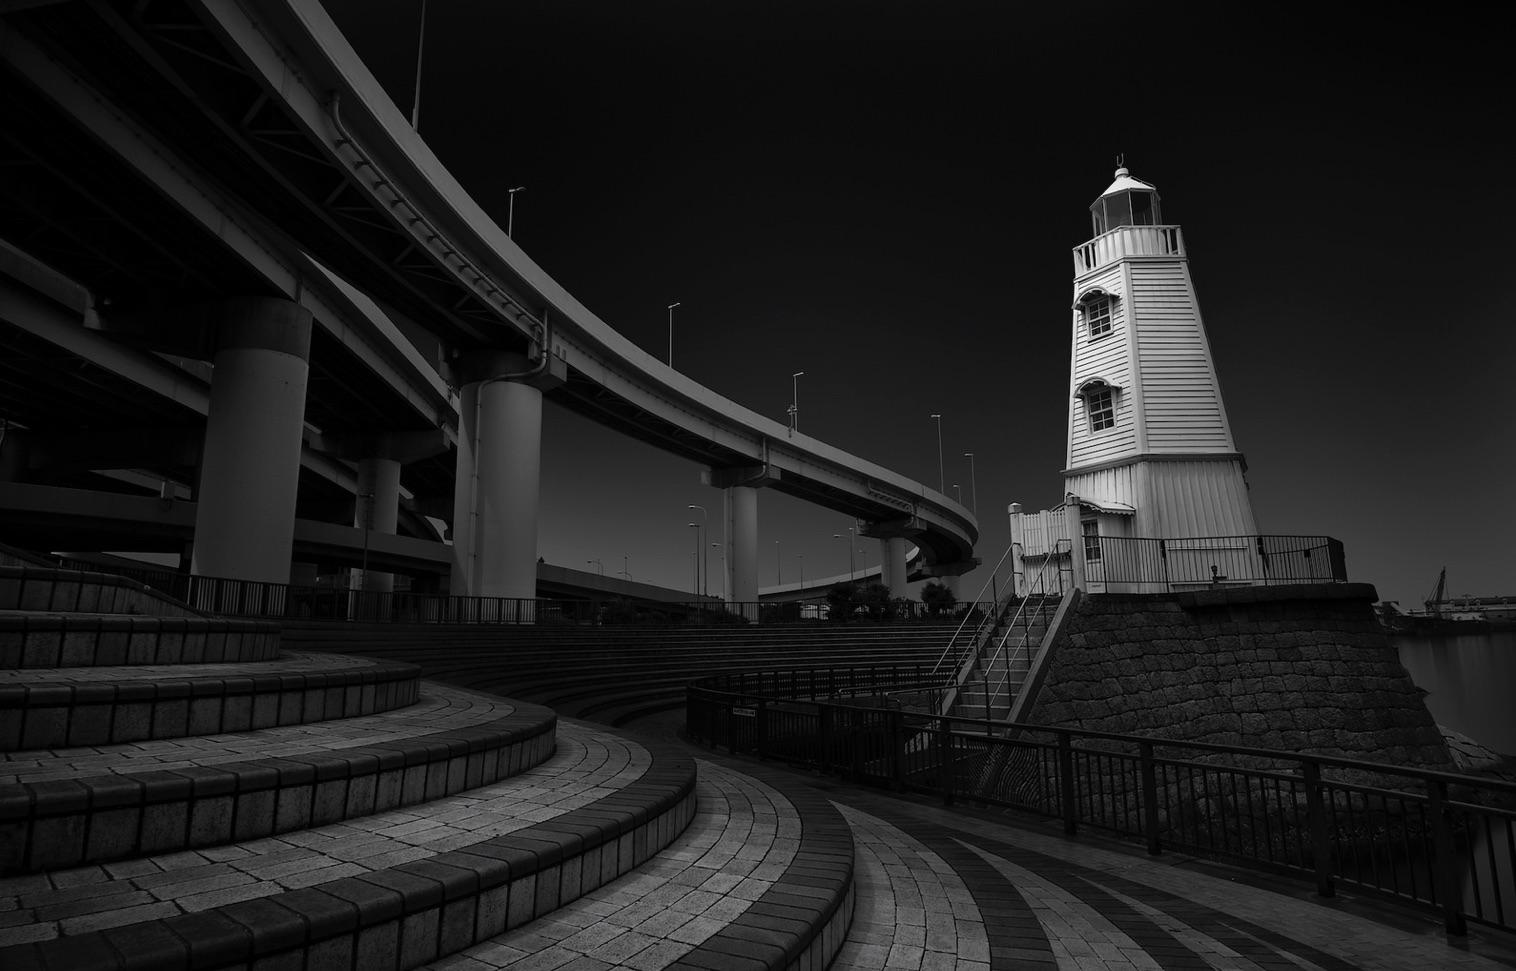 Stream of Time - Jin Mikami